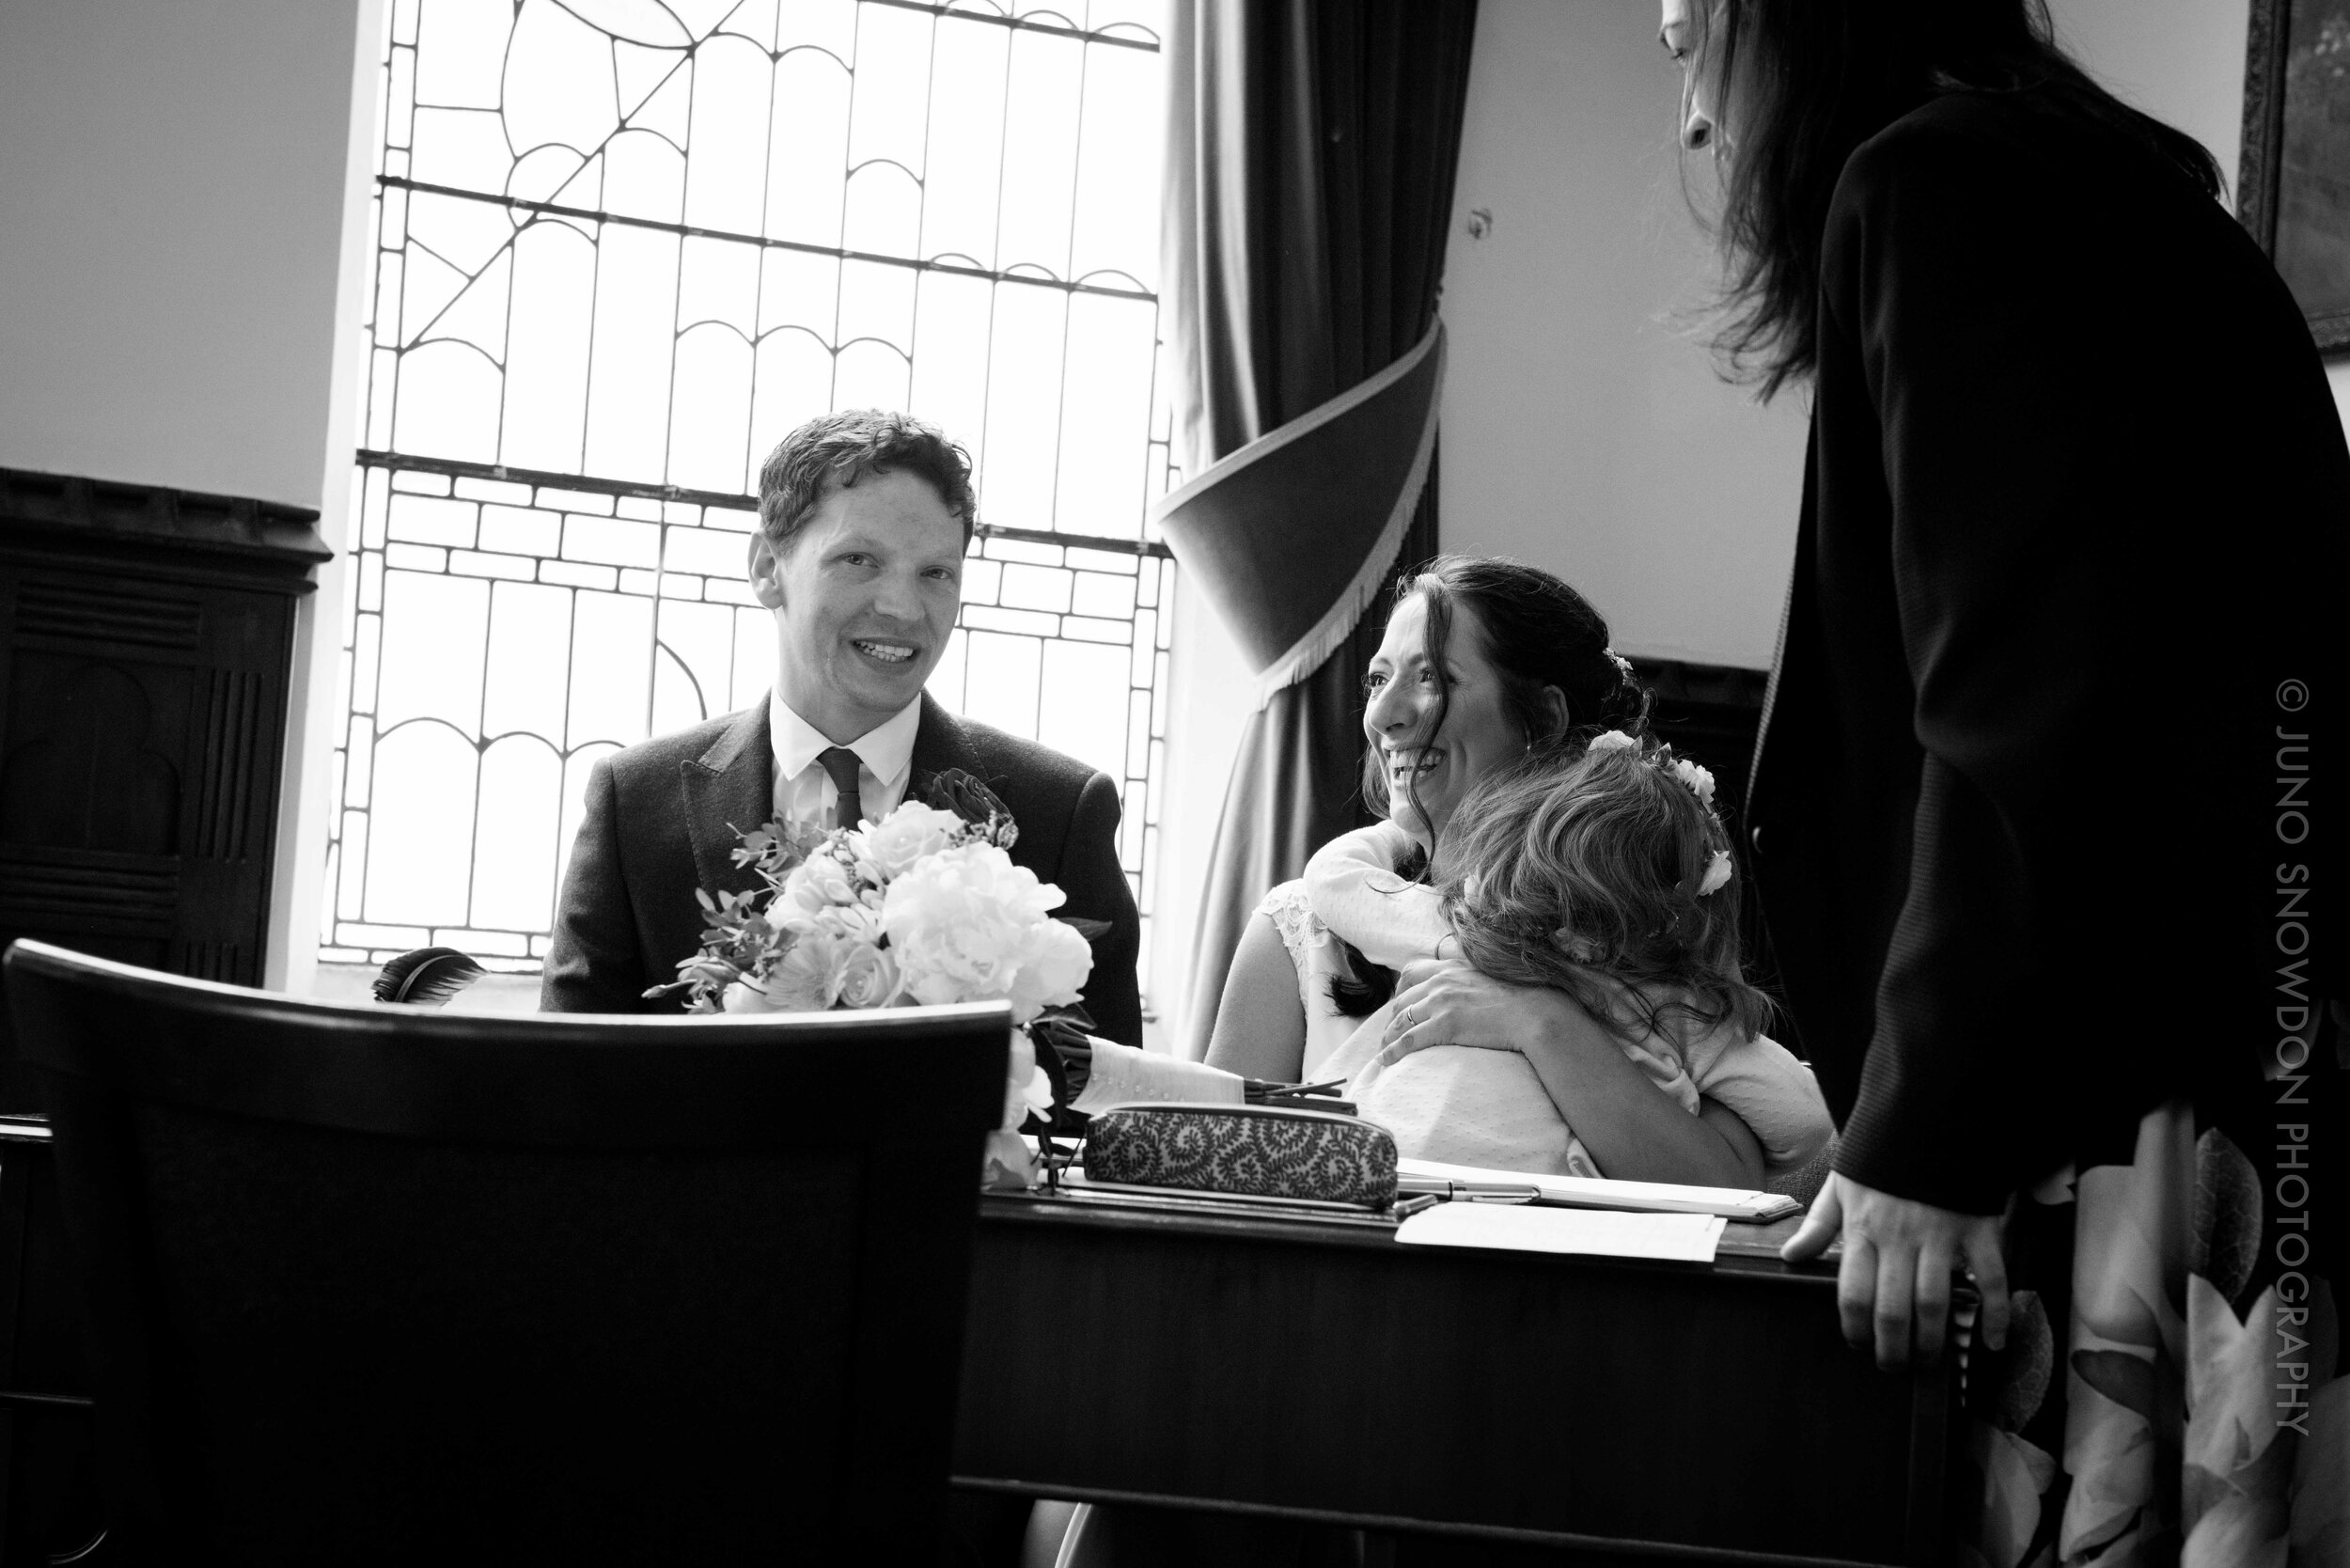 juno-snowdon-photography-wedding-7292.jpg